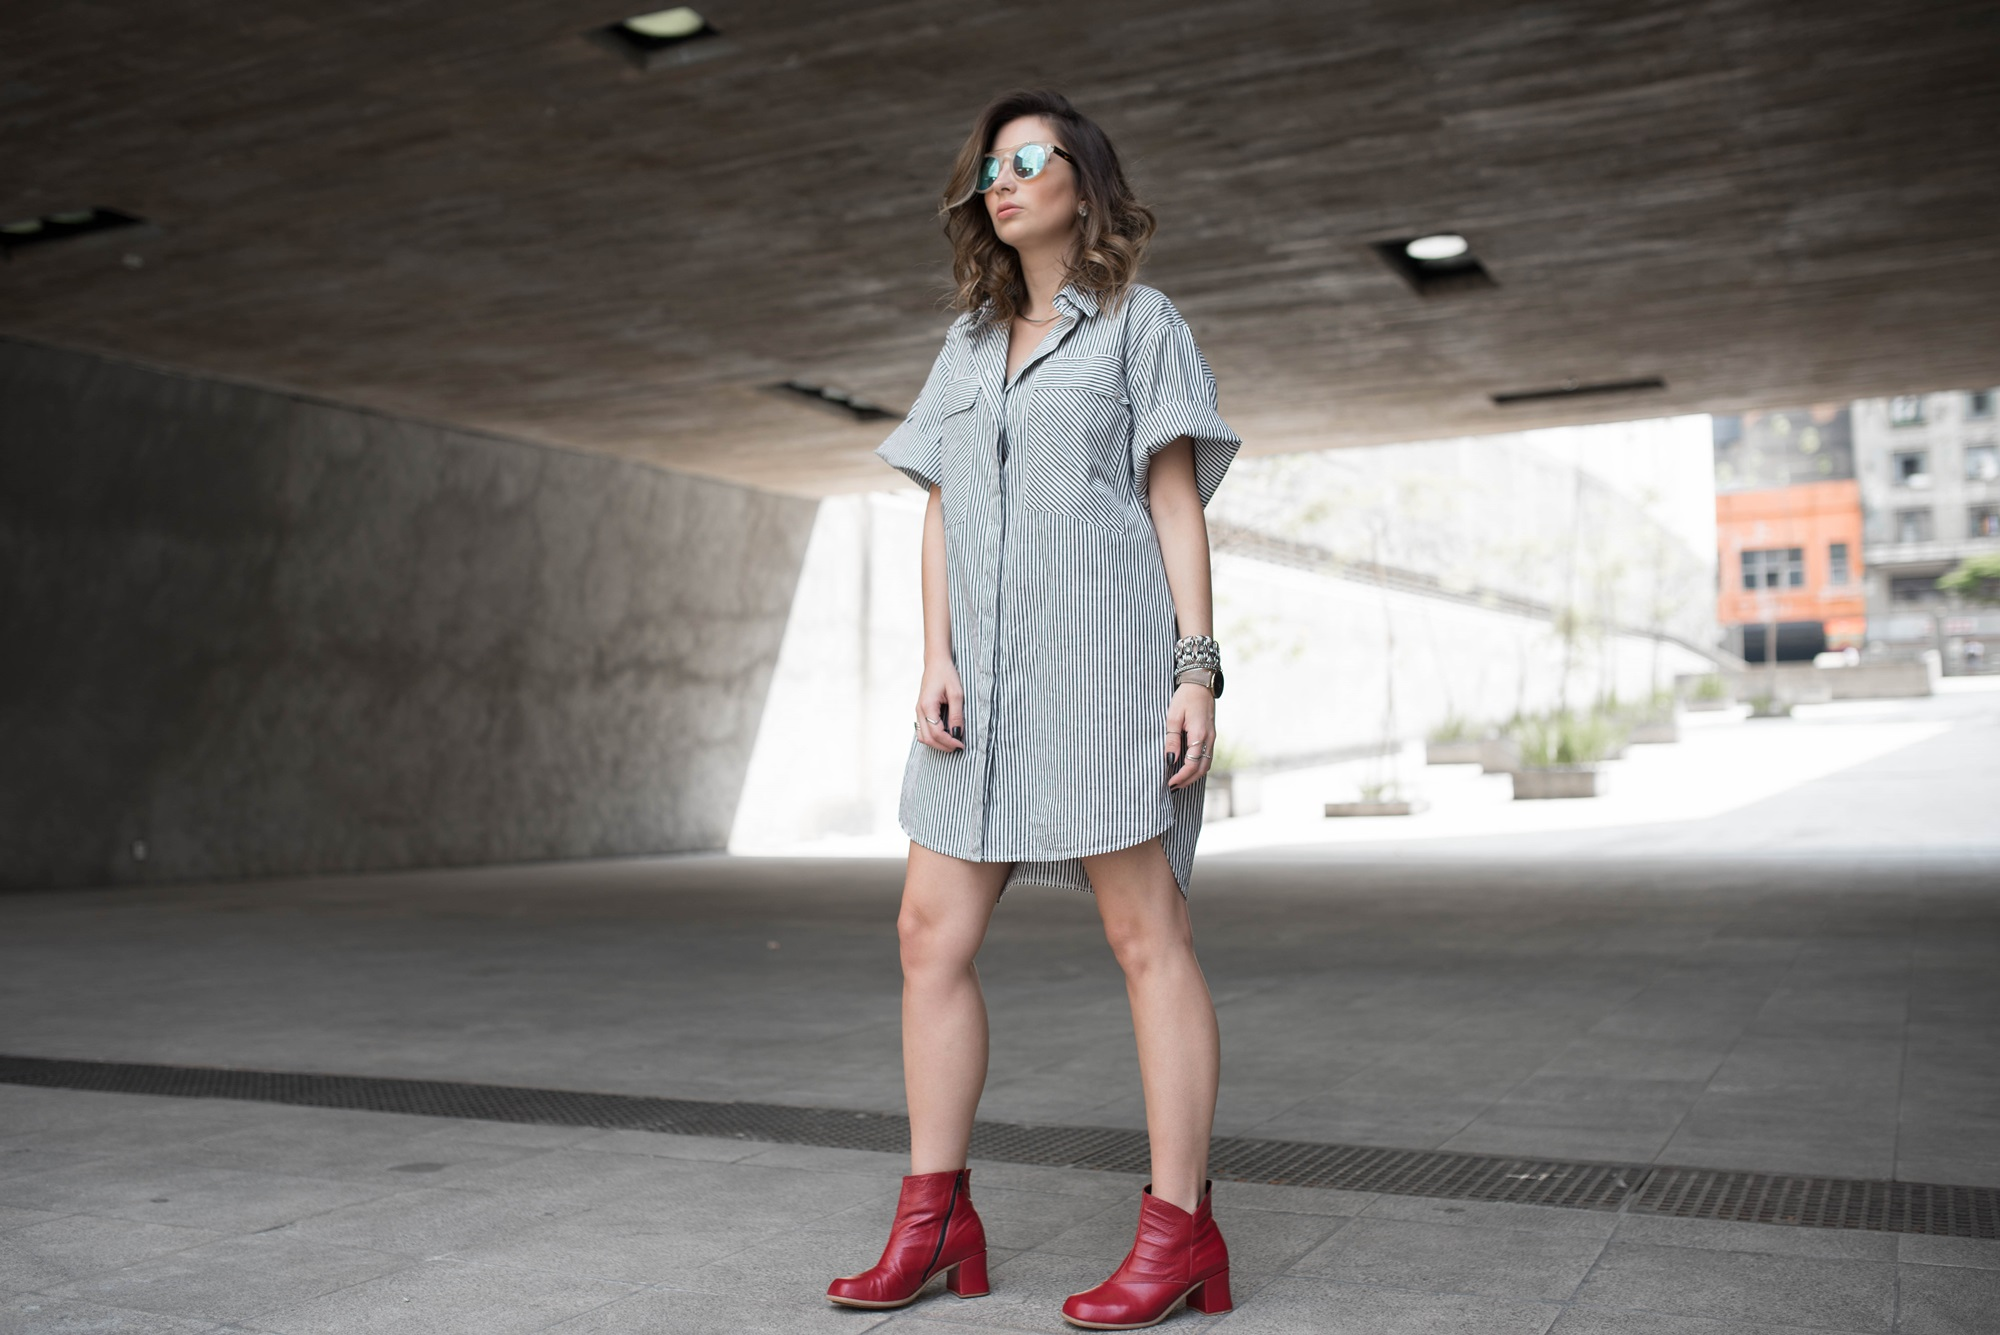 look-vestido-chemise-camisa-bota-cano-curto-vermelha-blog-vanduarte-3